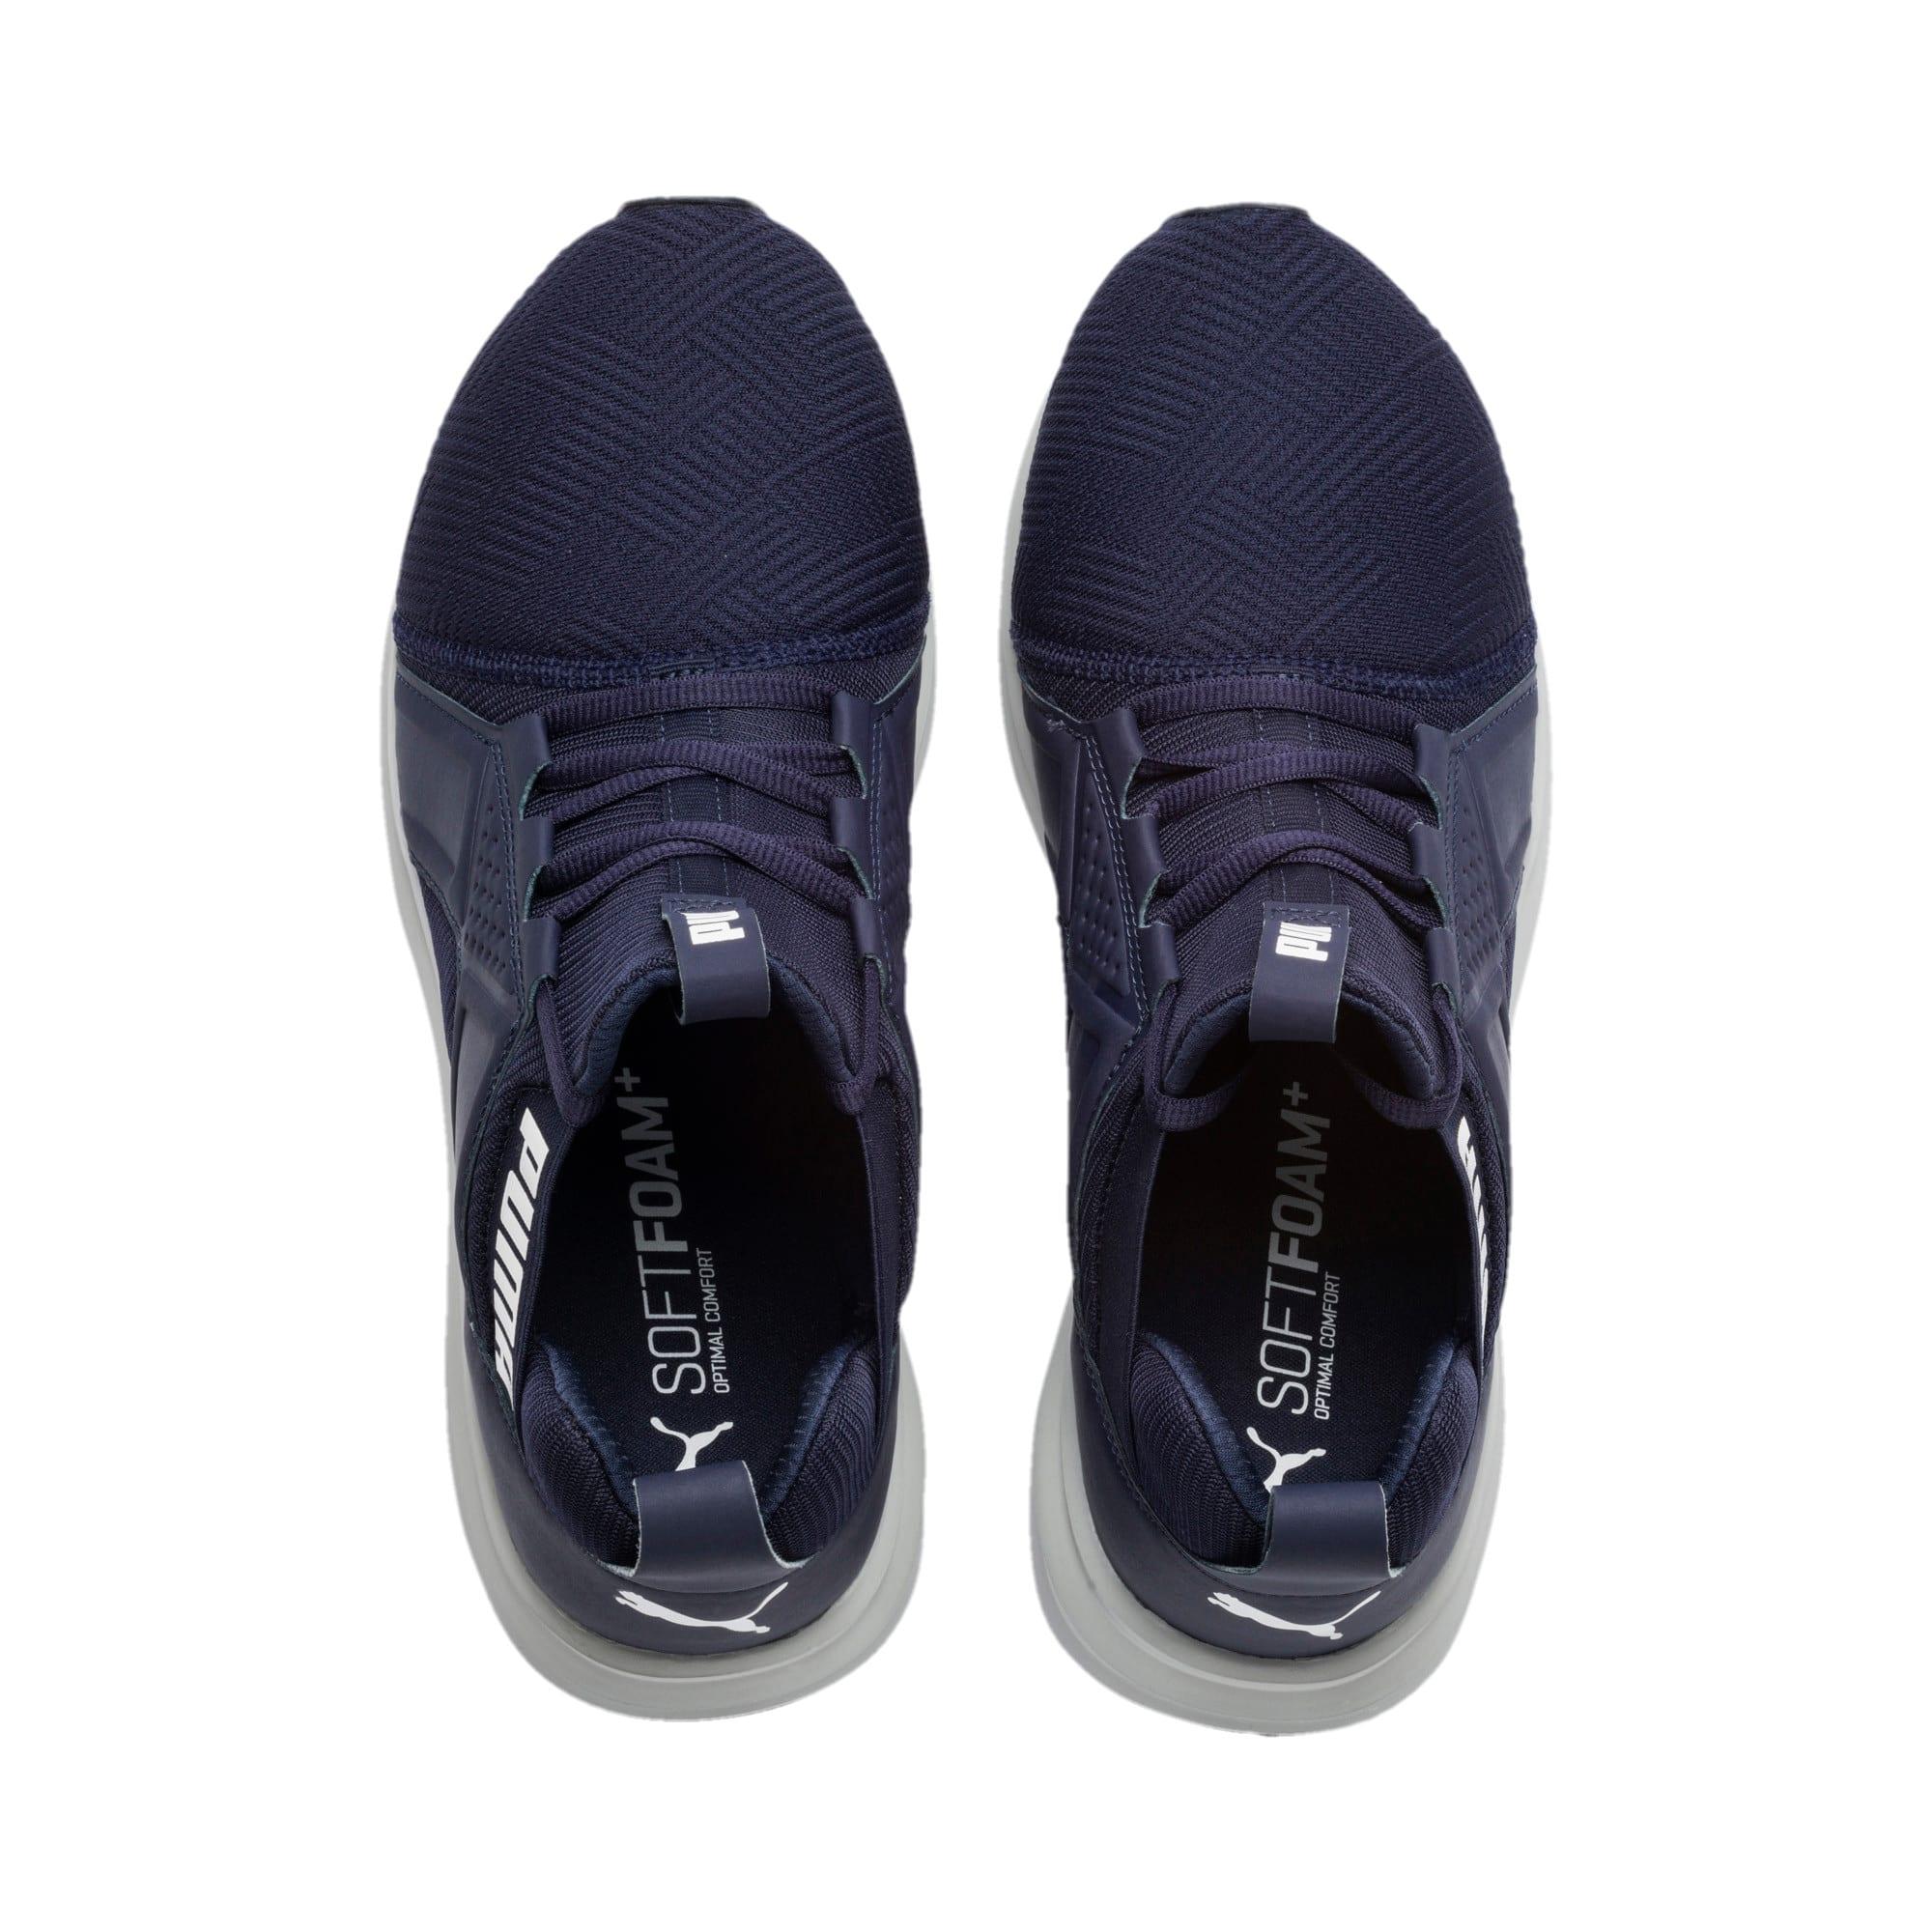 Thumbnail 6 of Enzo Geo Men's Sneakers, Peacoat, medium